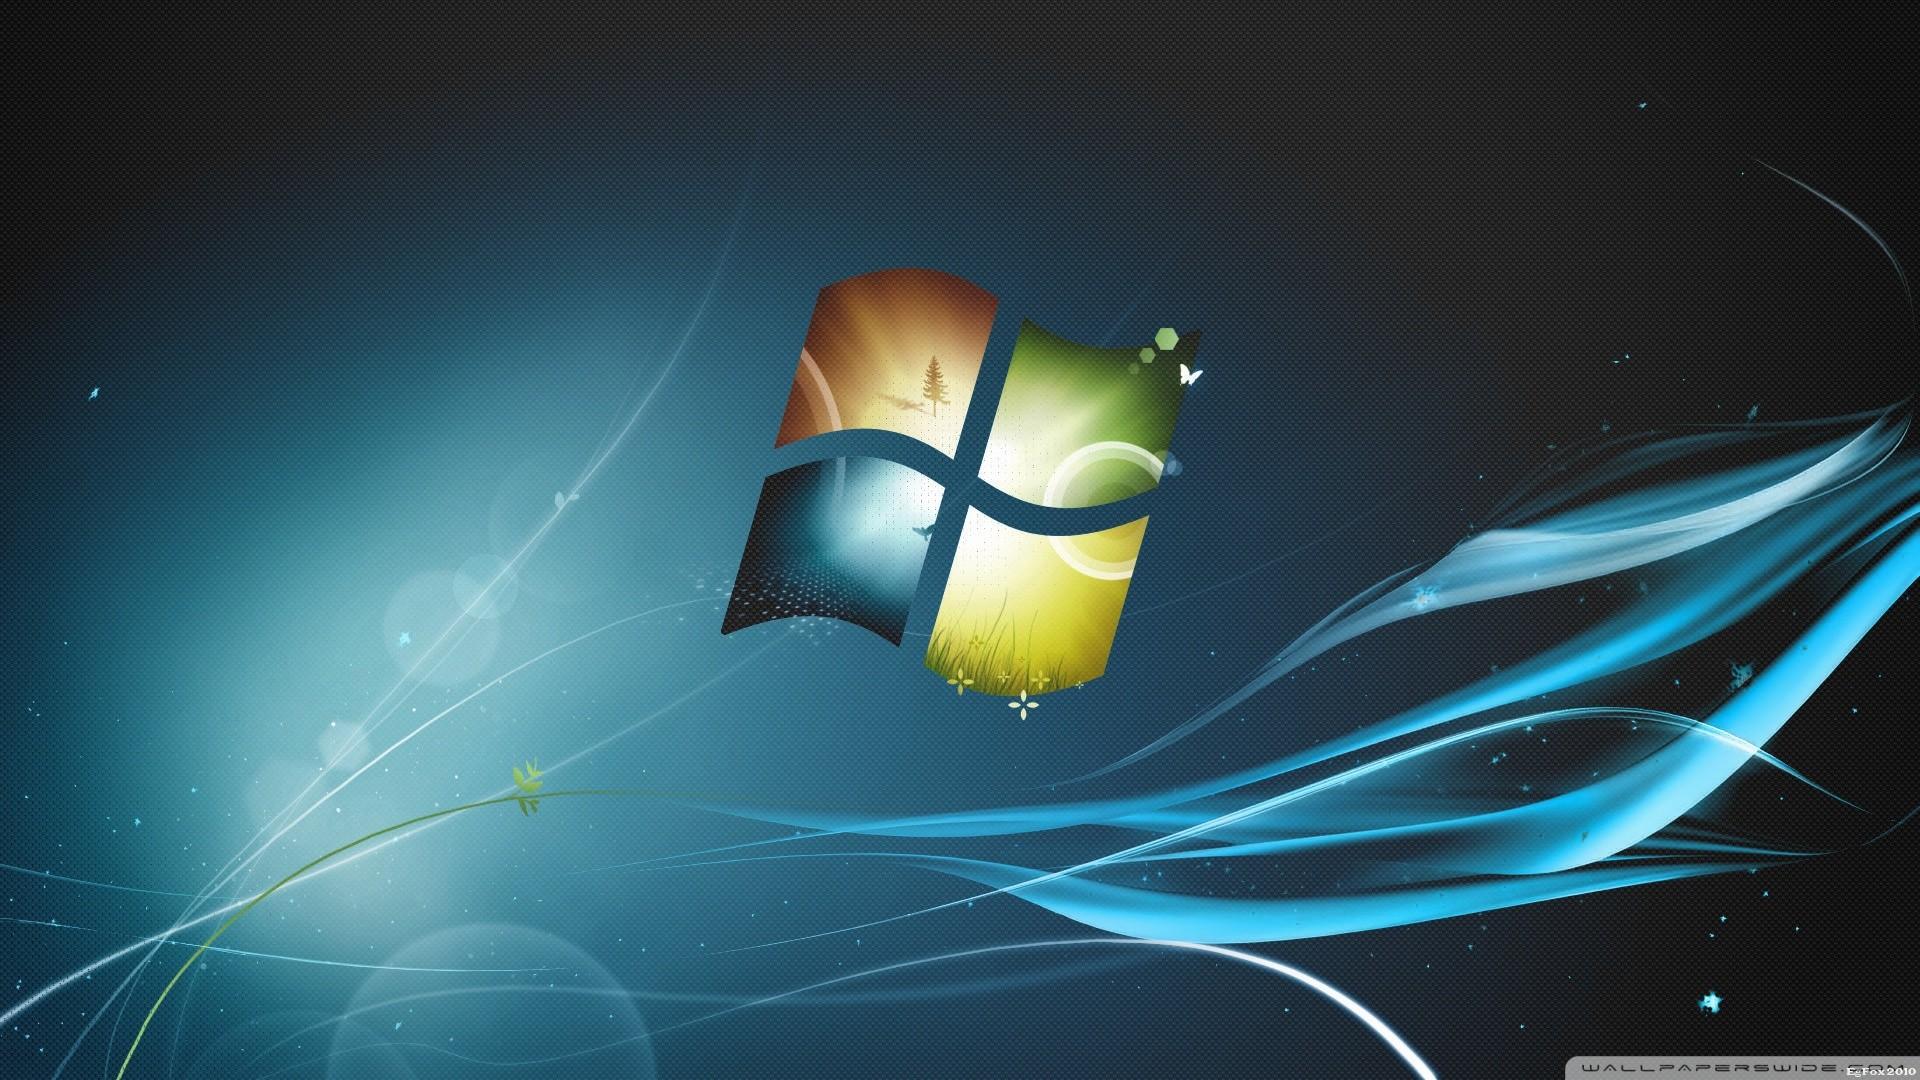 52 Windows 7 Wallpaper Hd 1920 1080